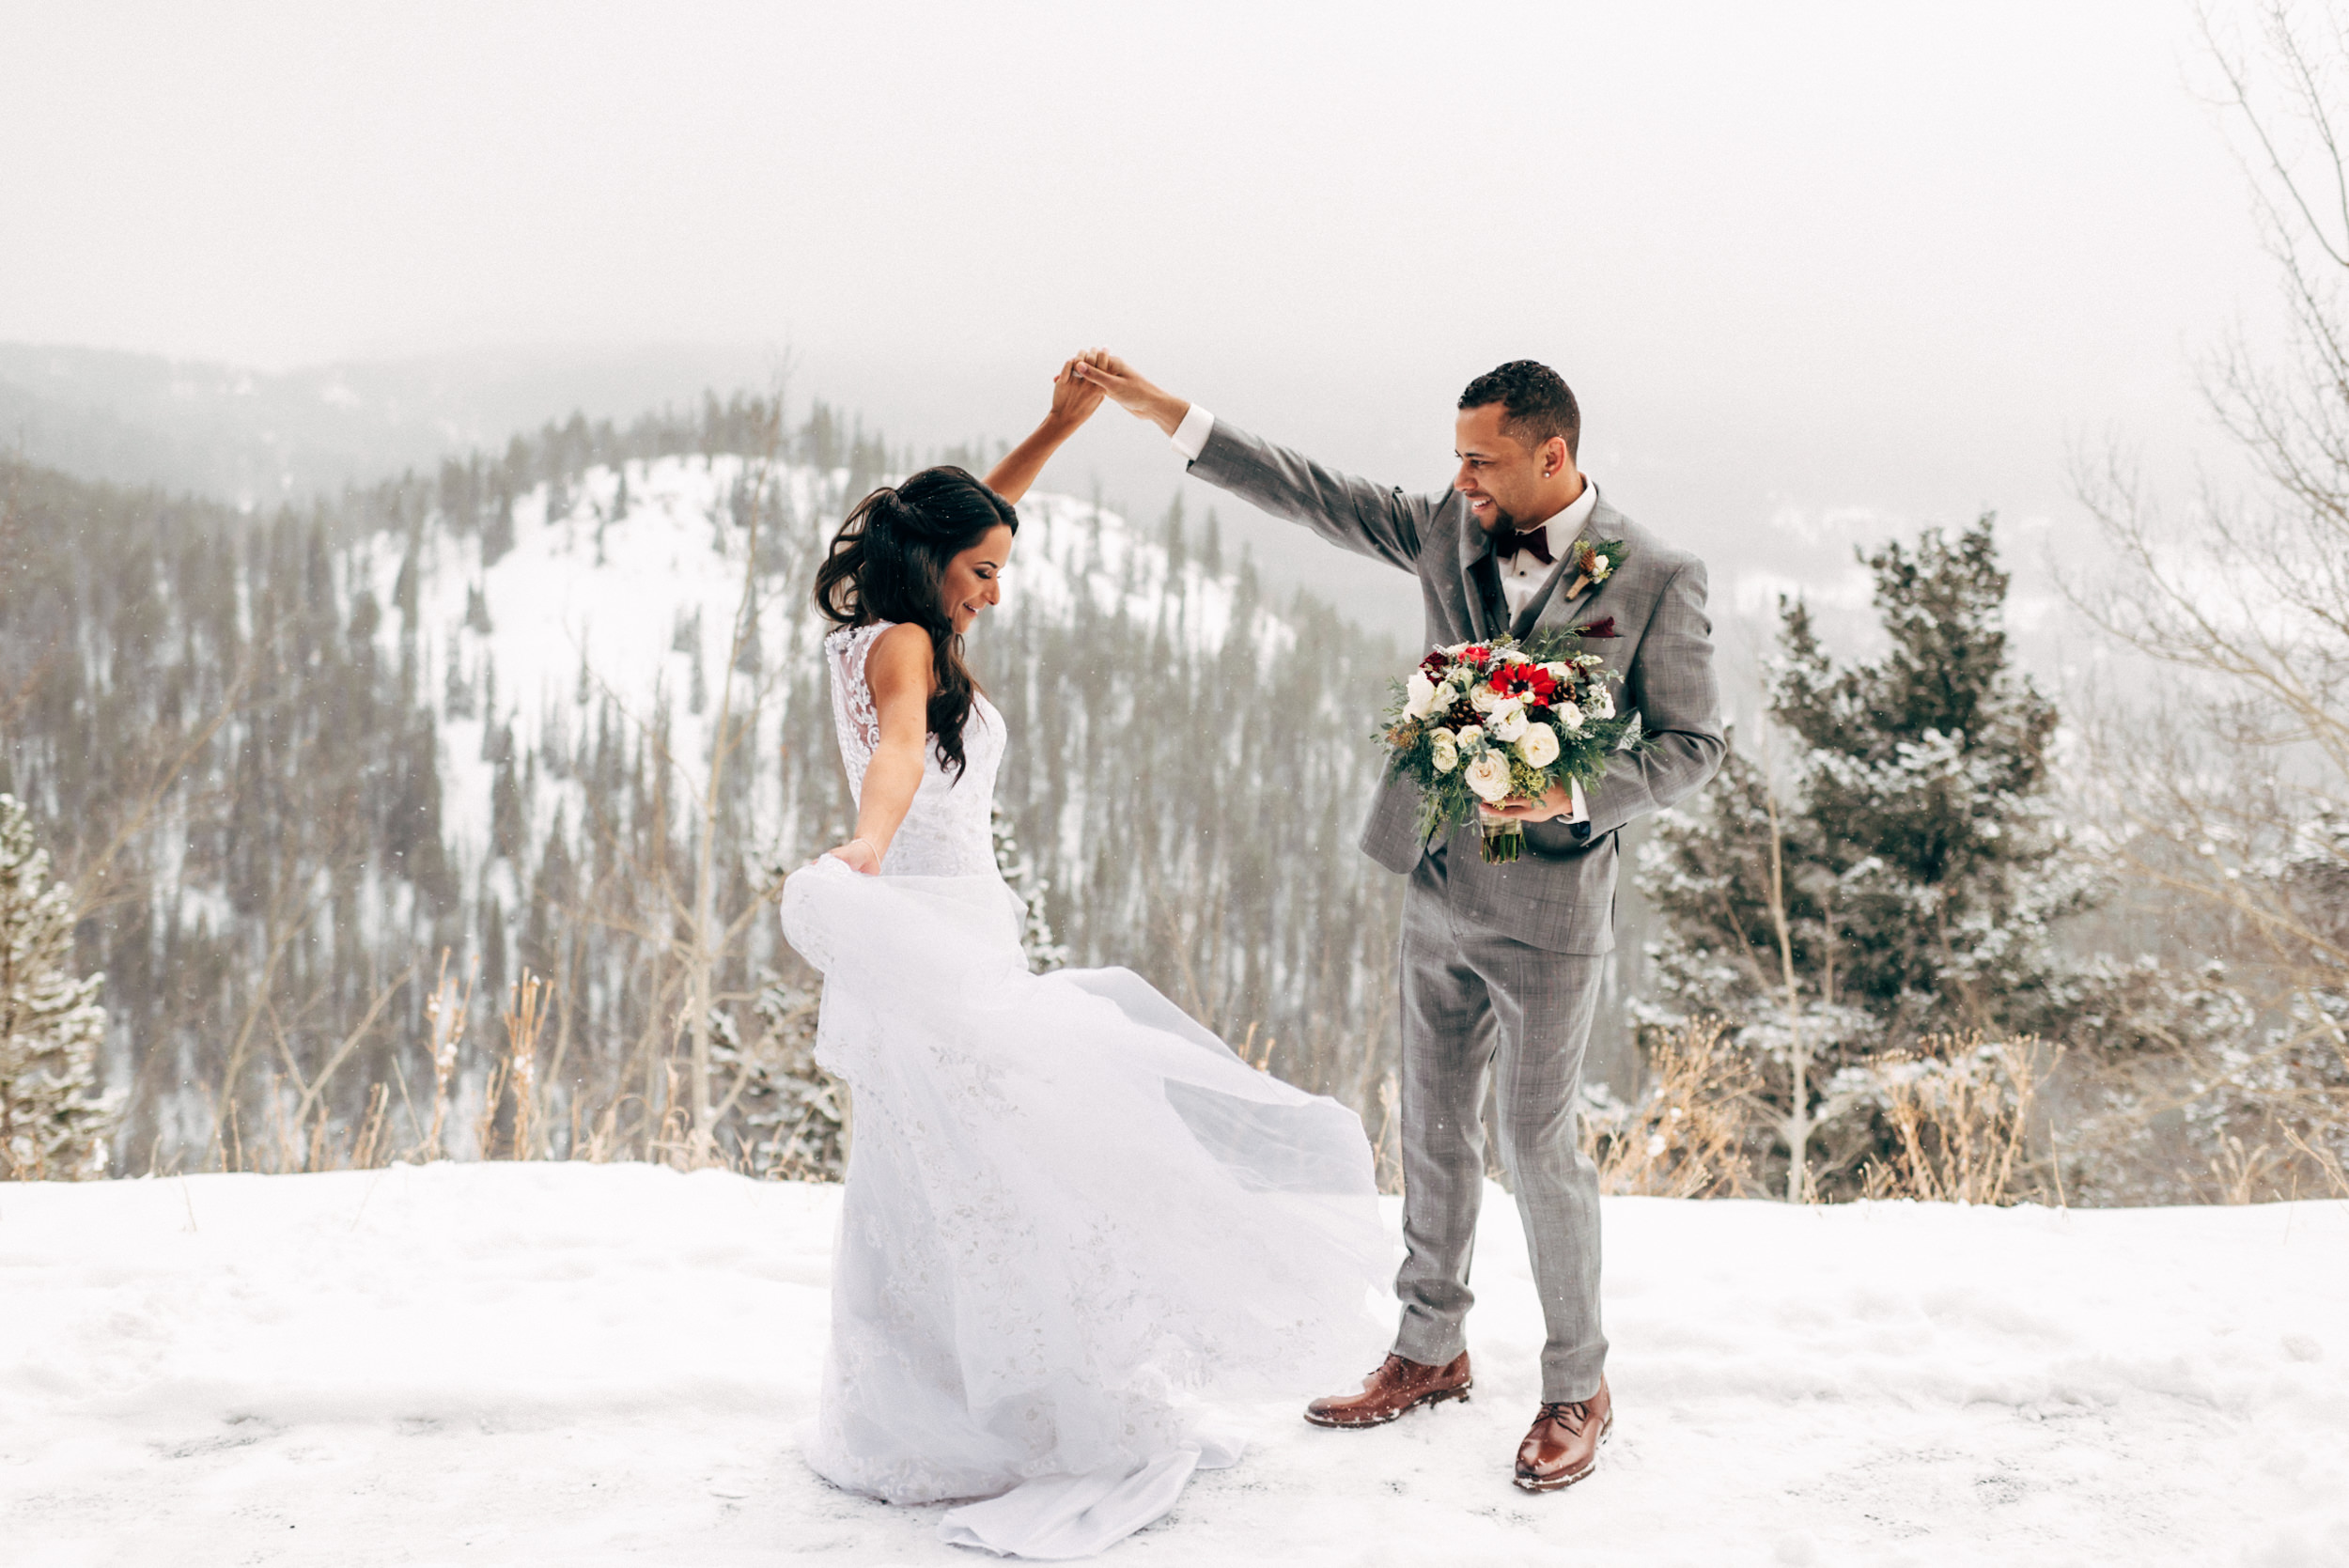 Bride and groom dancing on a snowy Colorado Breckenridge mountain top. Colorado wedding photographer.